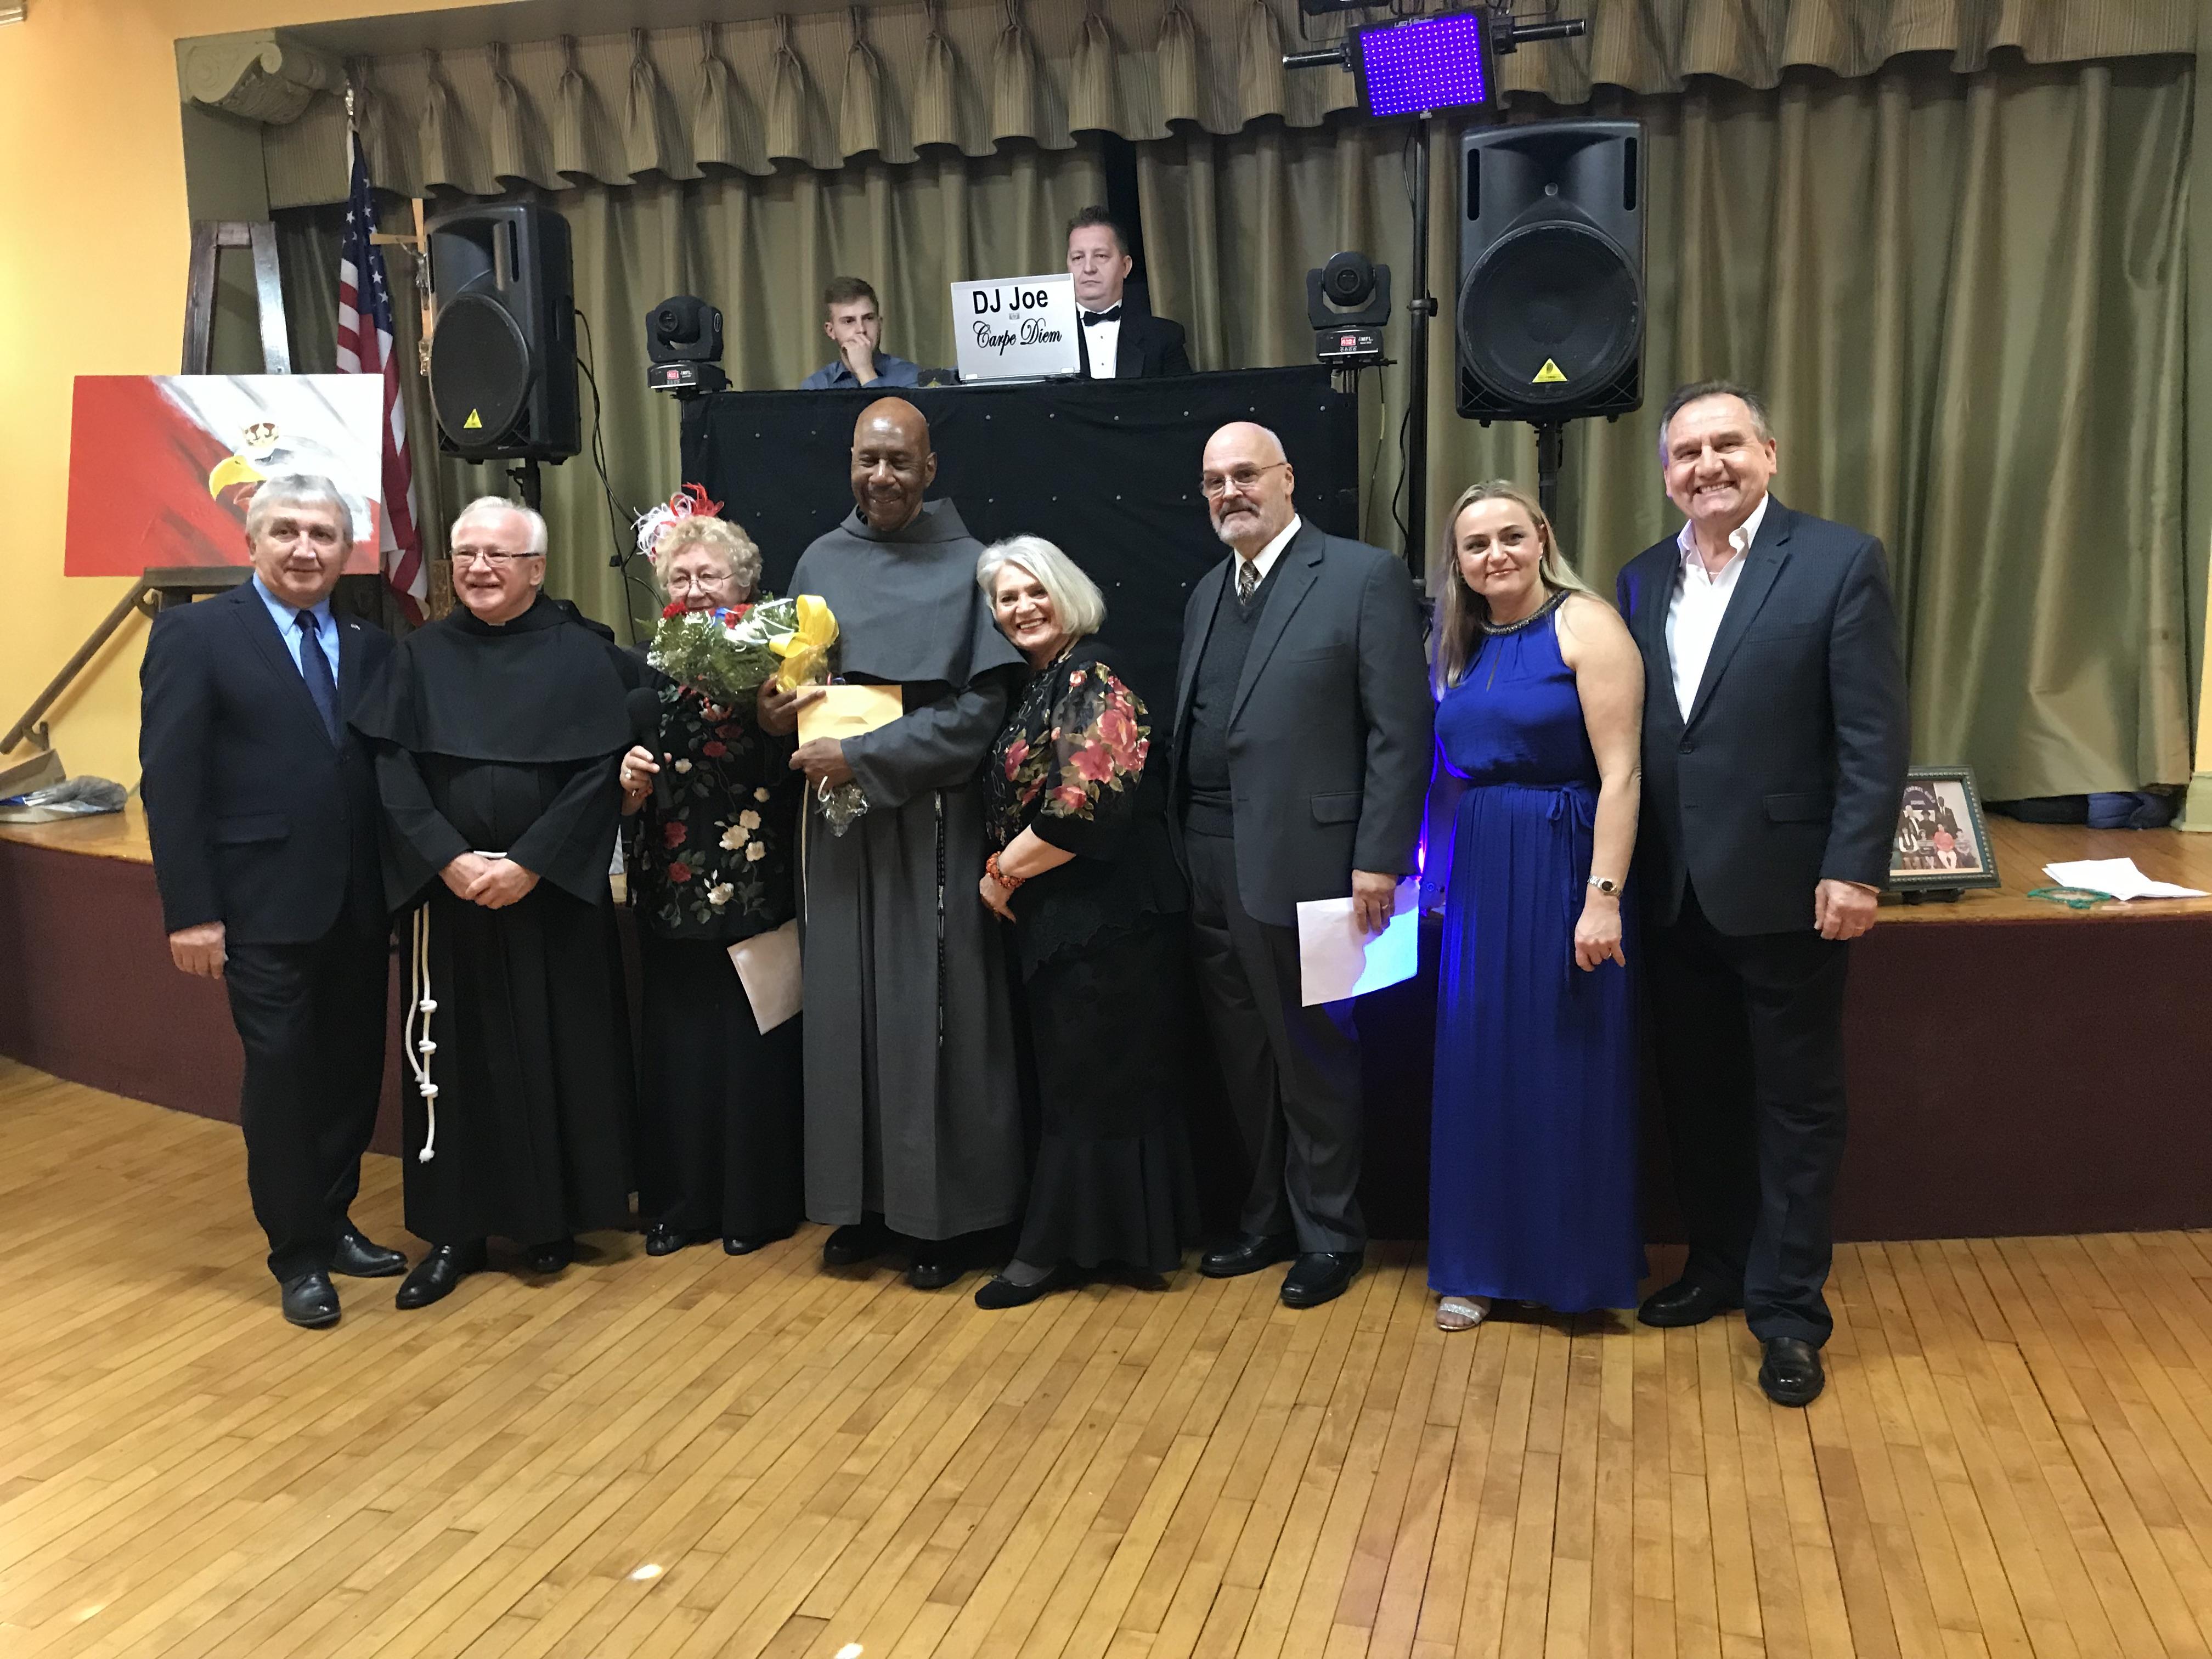 Polonijna zabawa Andrzejkowa w parafii Jana Kantego w Clifton, NJ.